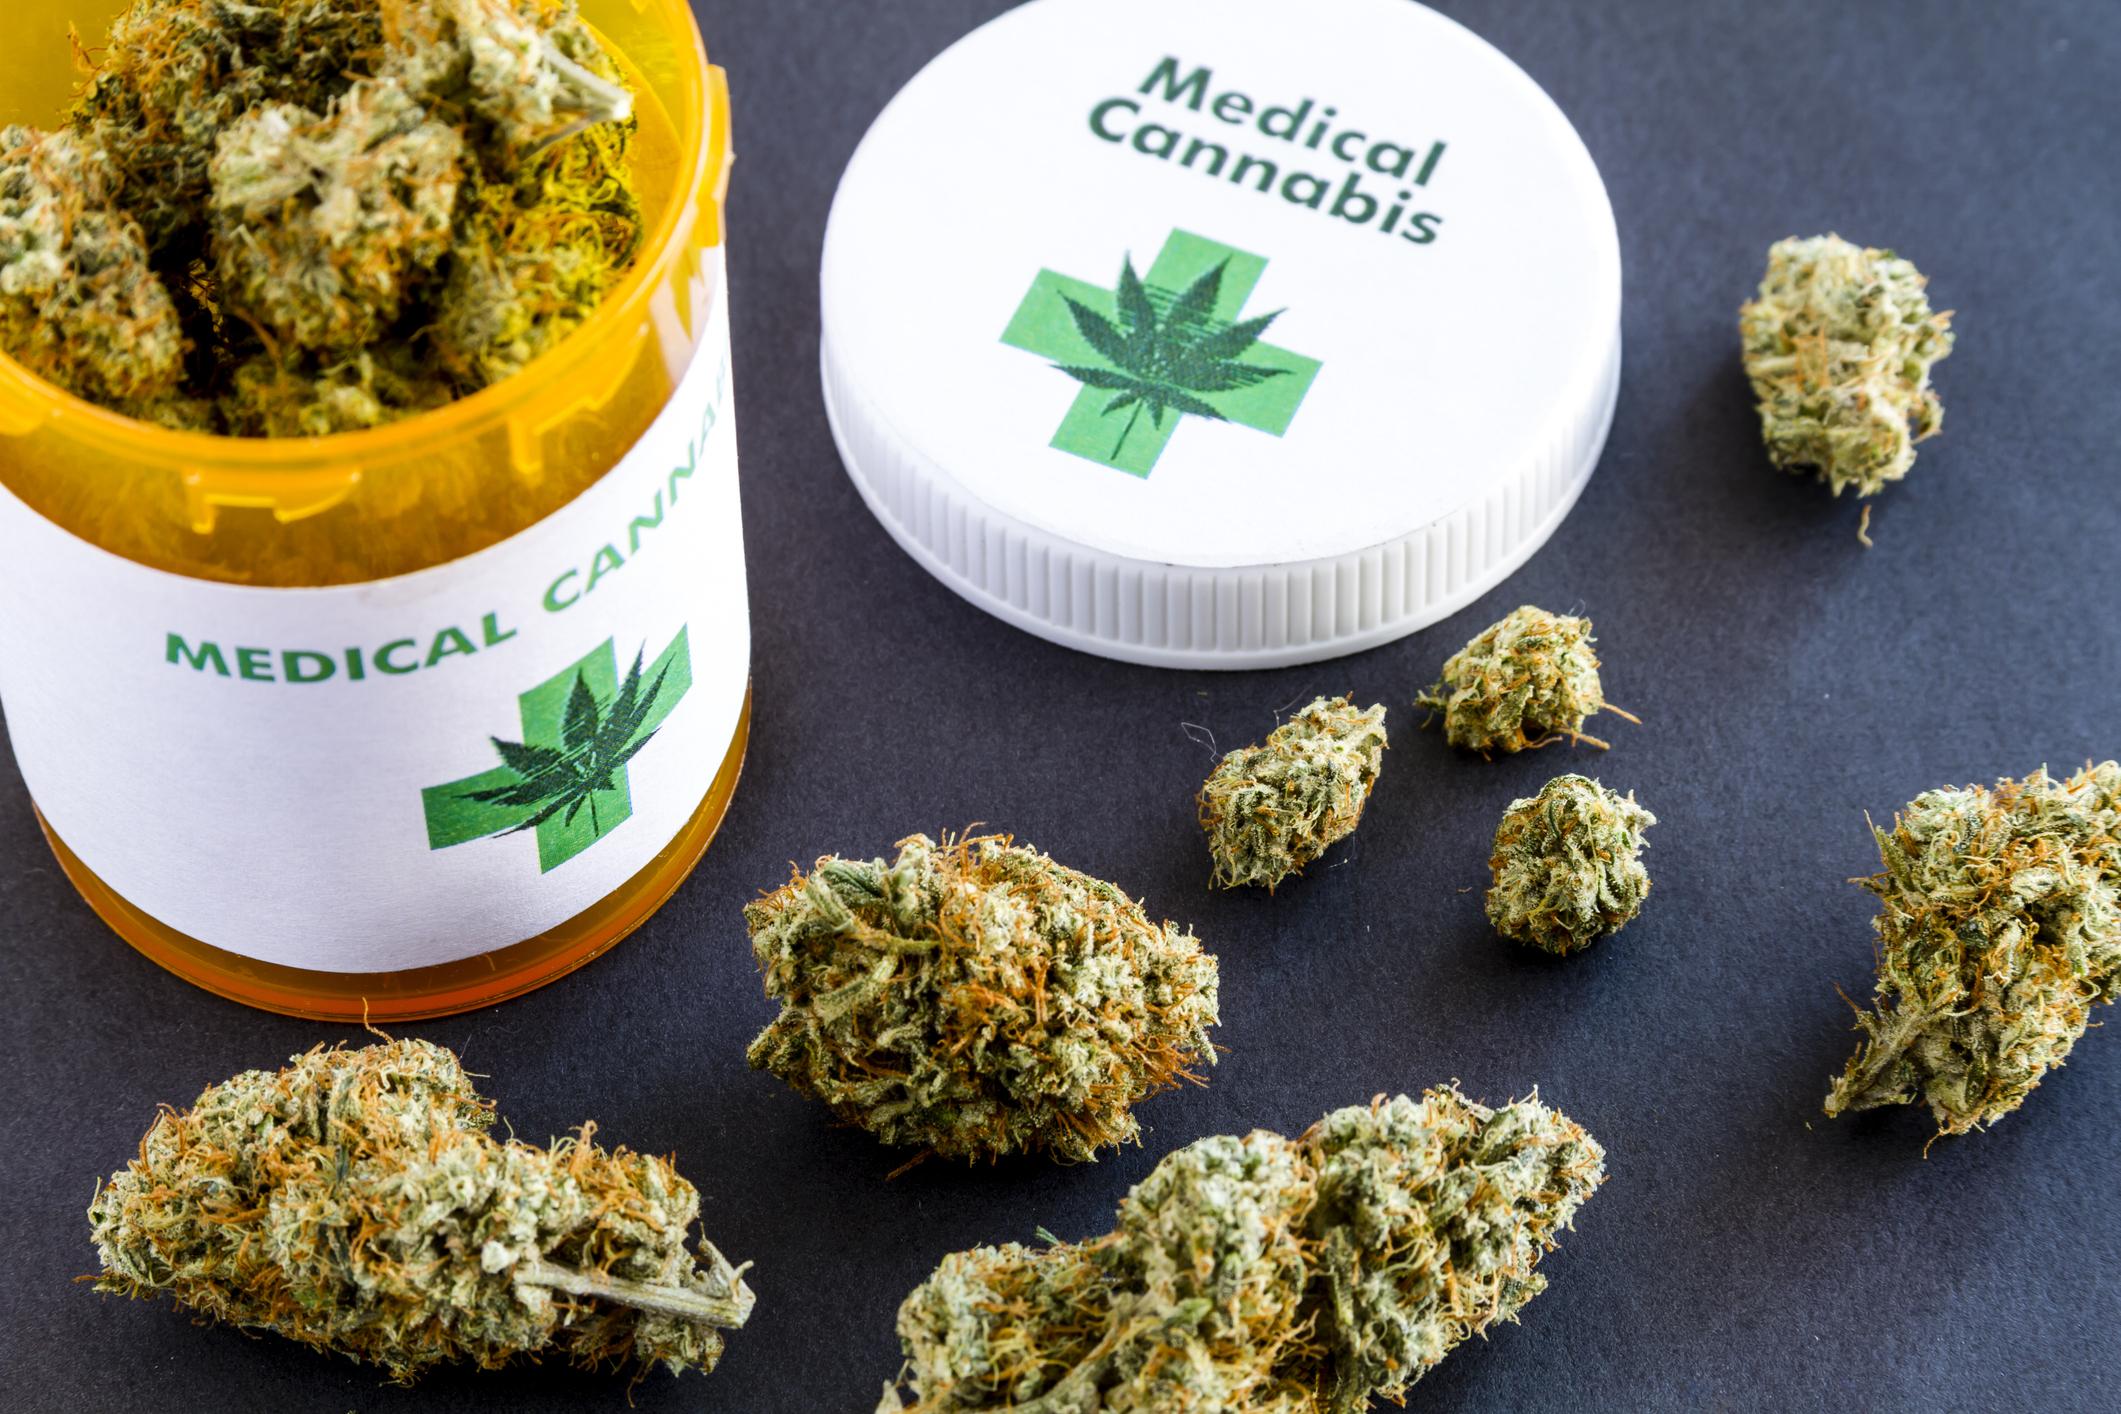 Marijuana sits around an open prescription bottle.